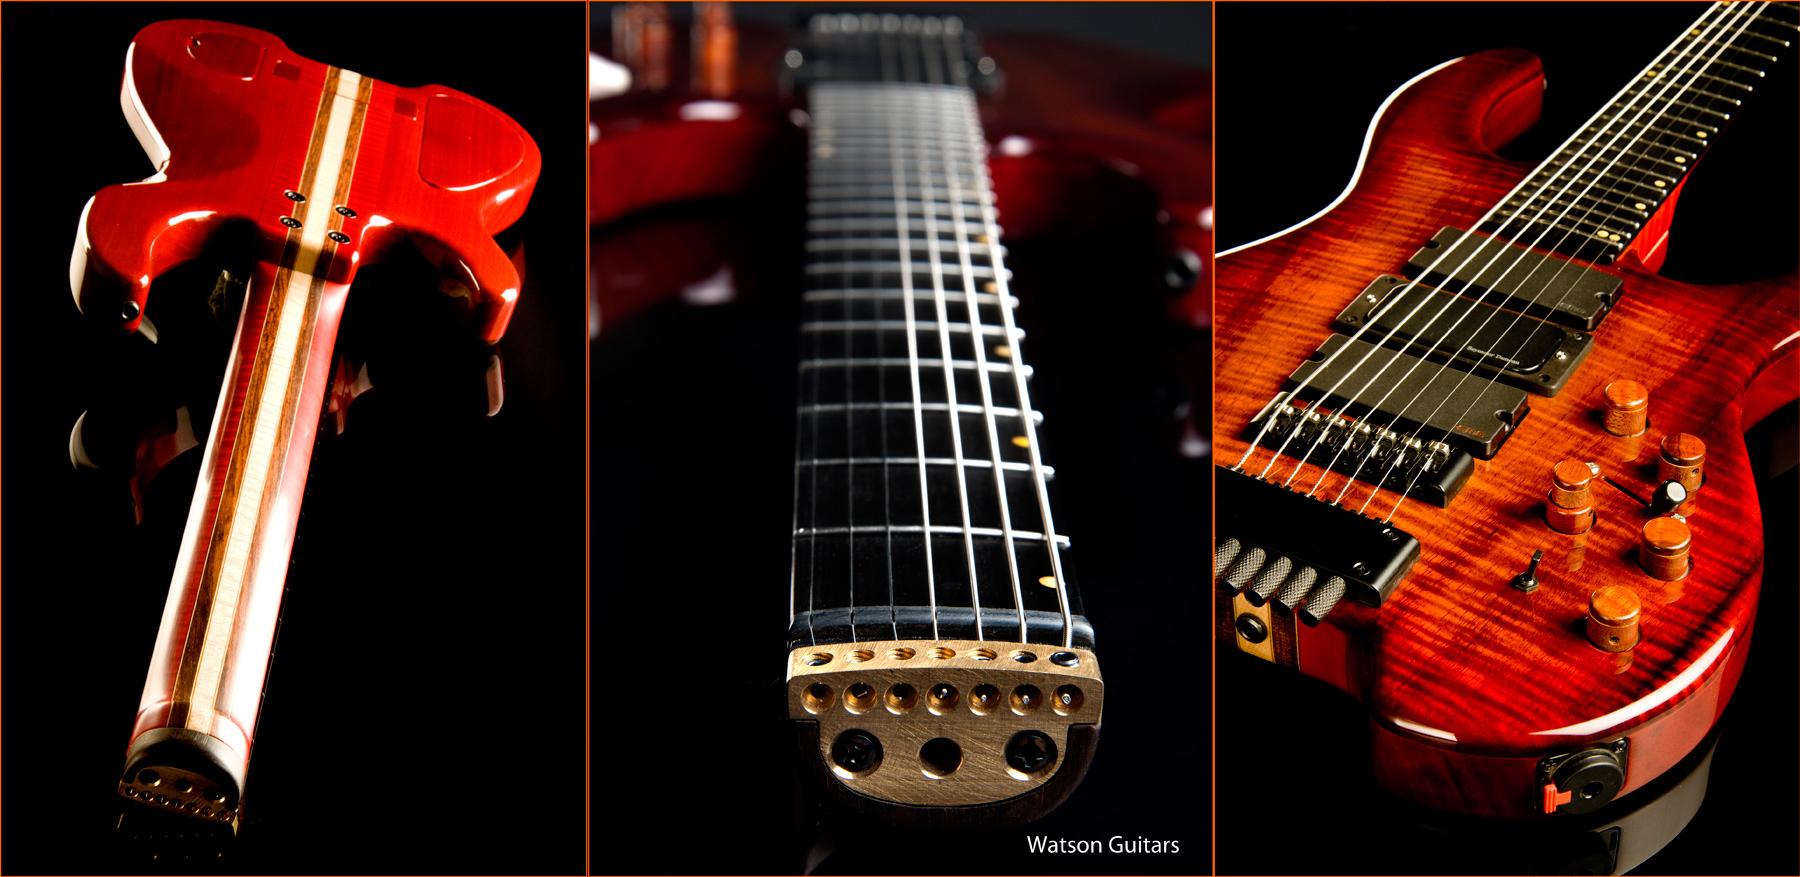 Alex Watson Guitars 2-Musicman Photography